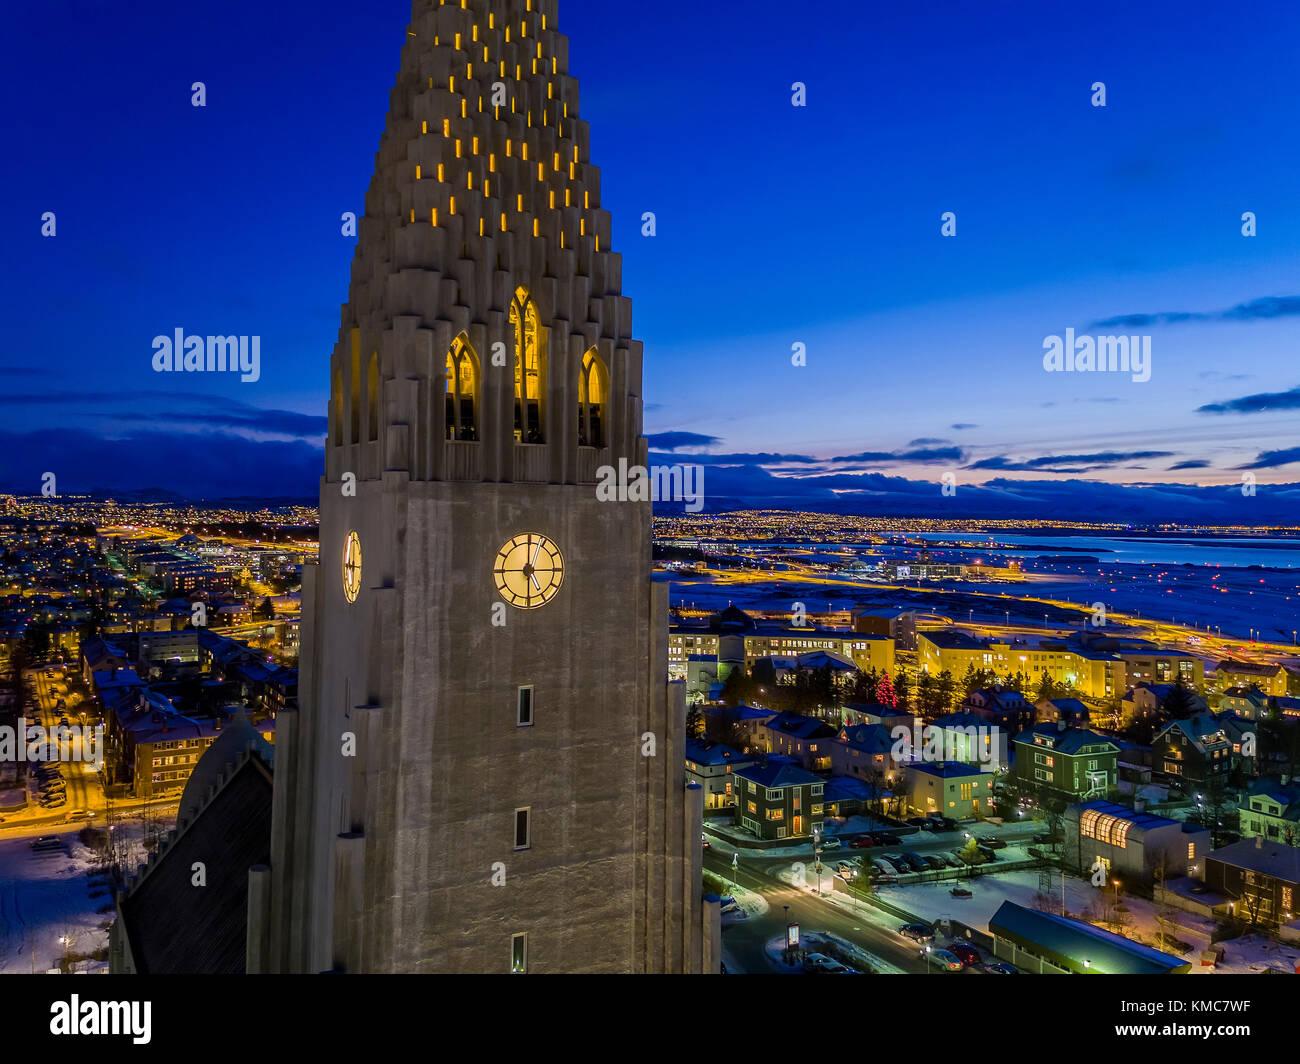 Hallgrimskirkja Church at night, Reykjavik, Iceland - Stock Image